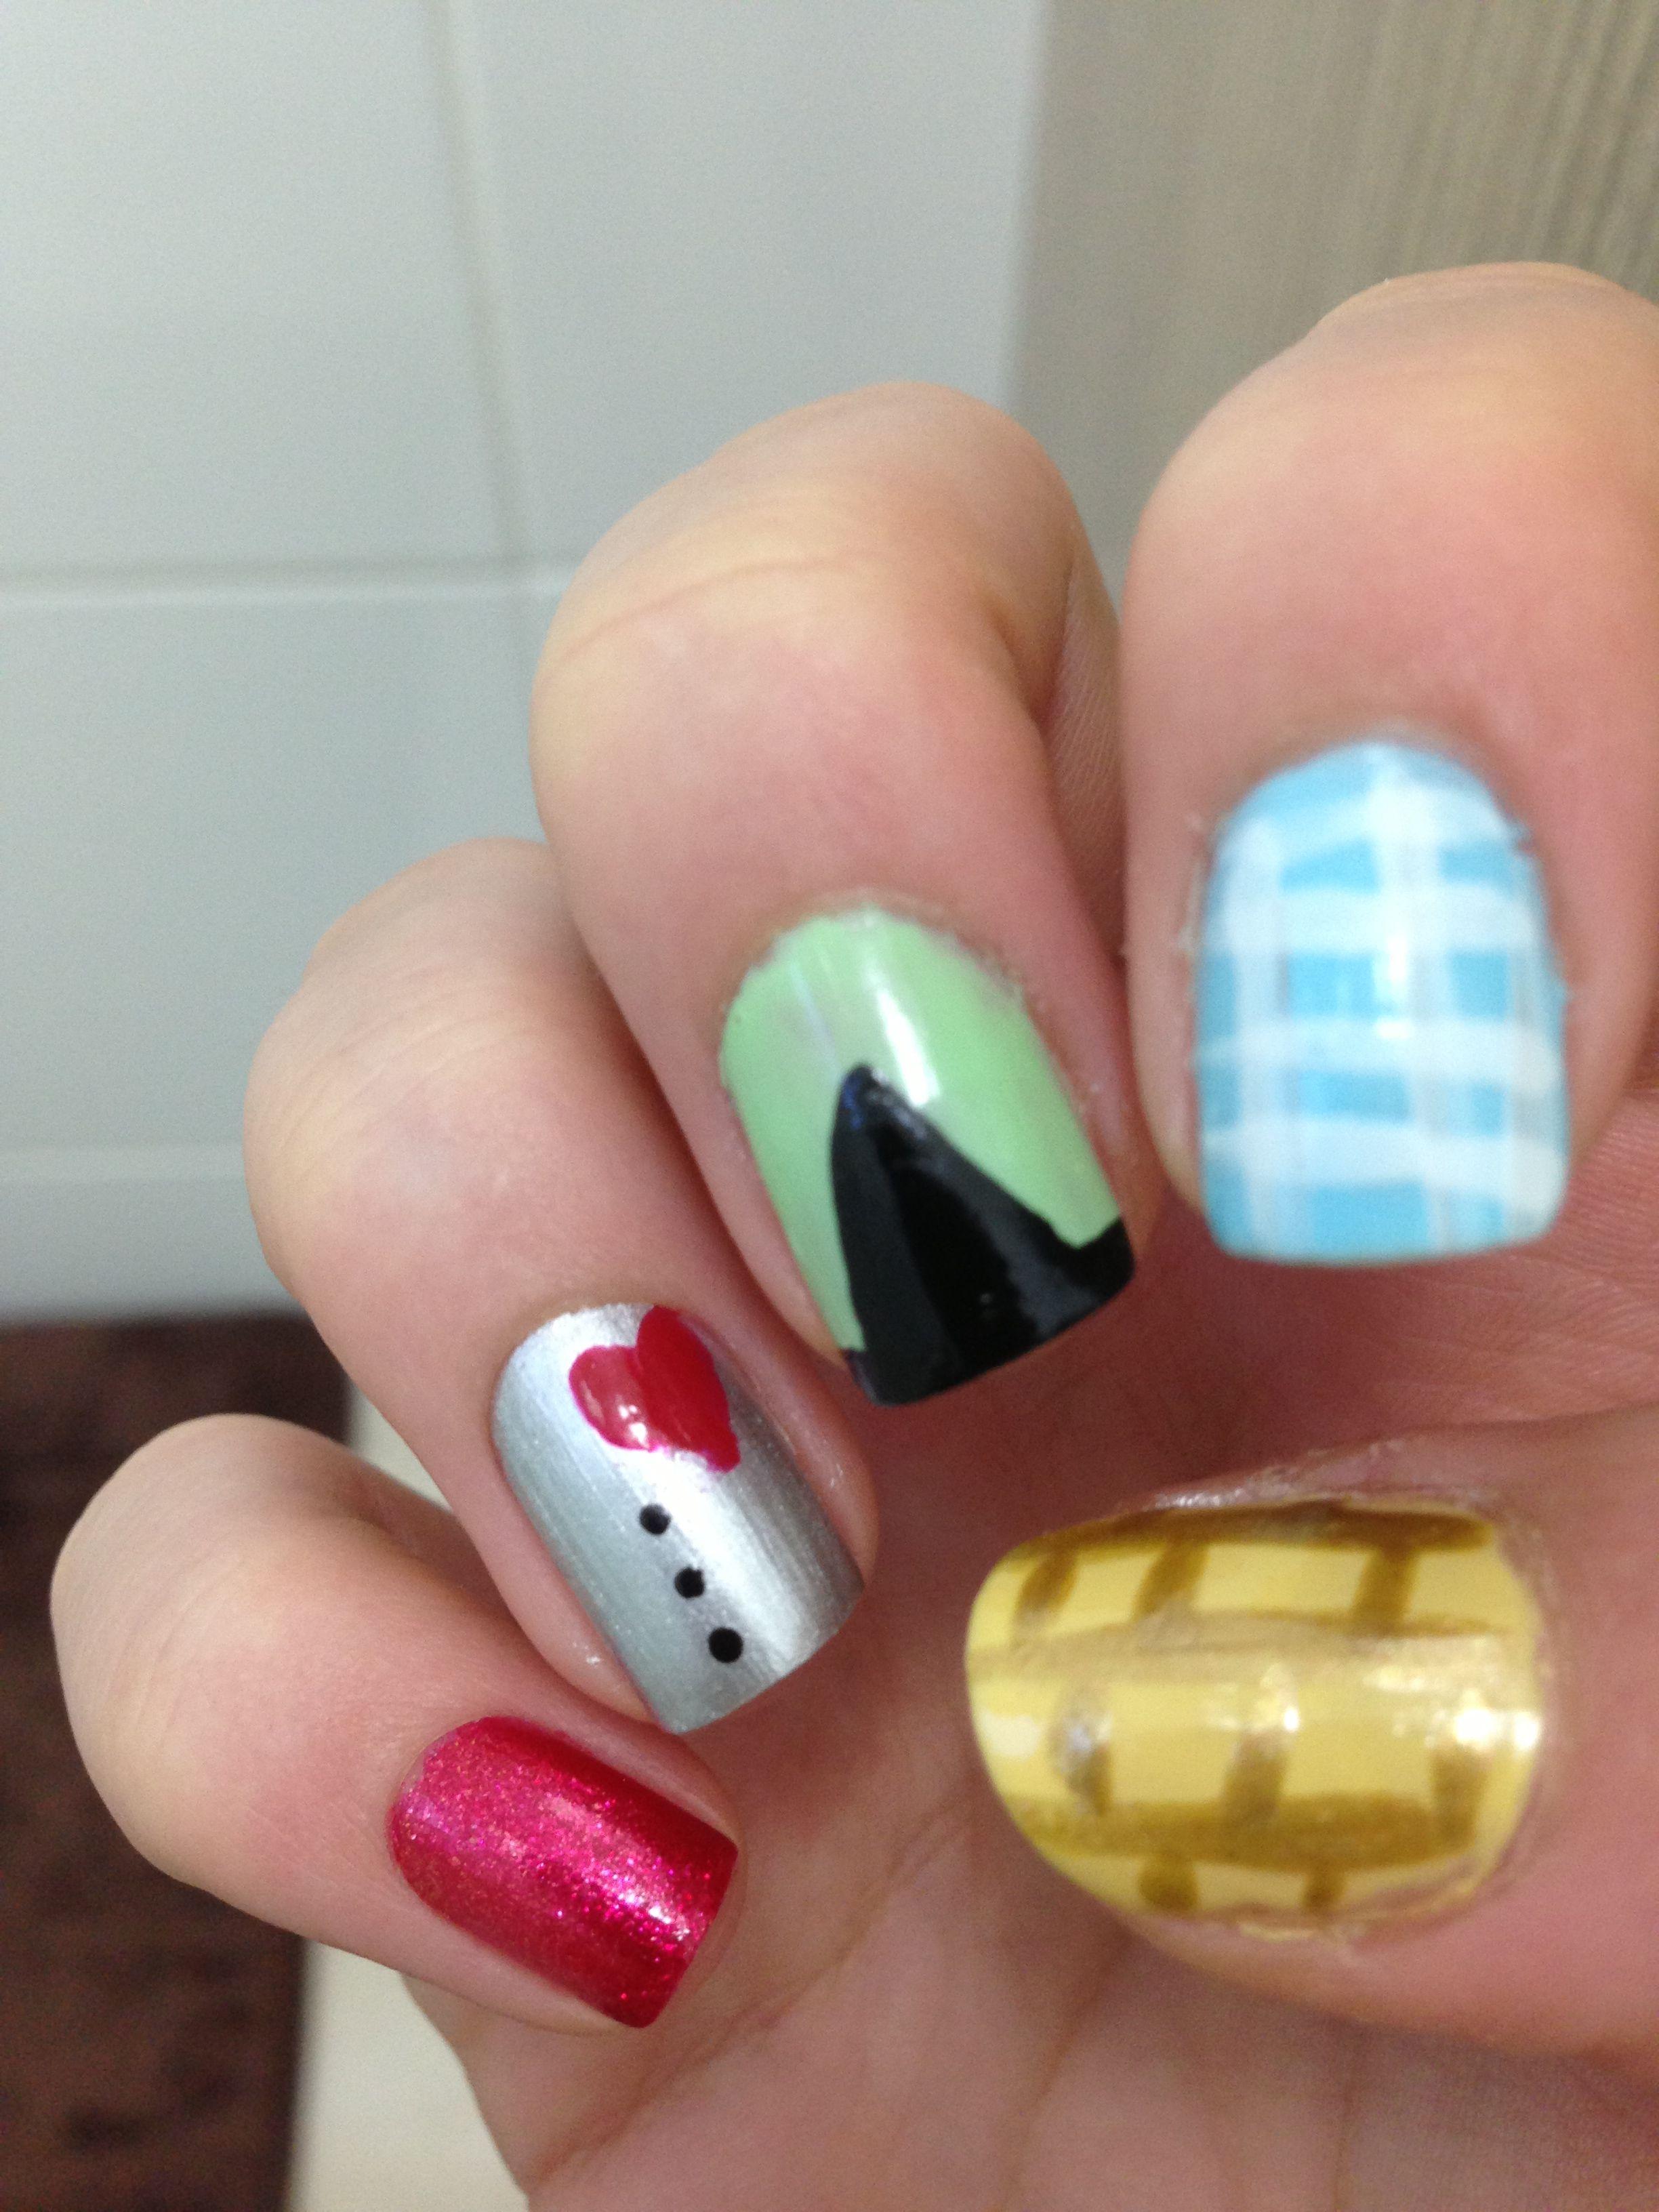 Wizard of oz nails   Nail art   Pinterest